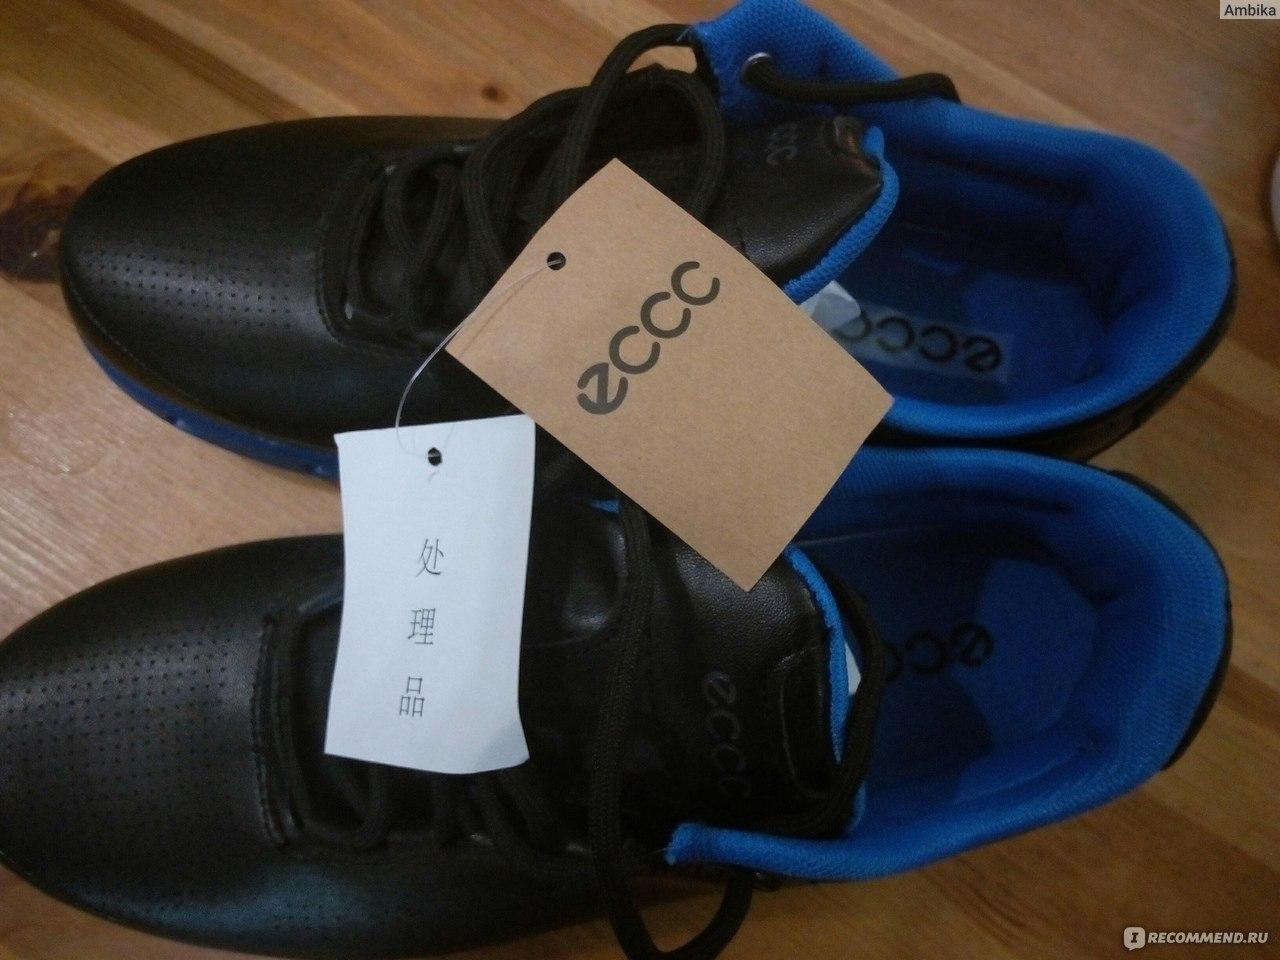 3bafab44891df6 ессо-shoes.nov.ru - Сайт Интернет-магазин Ессо - «Кроссовки Ecco ...